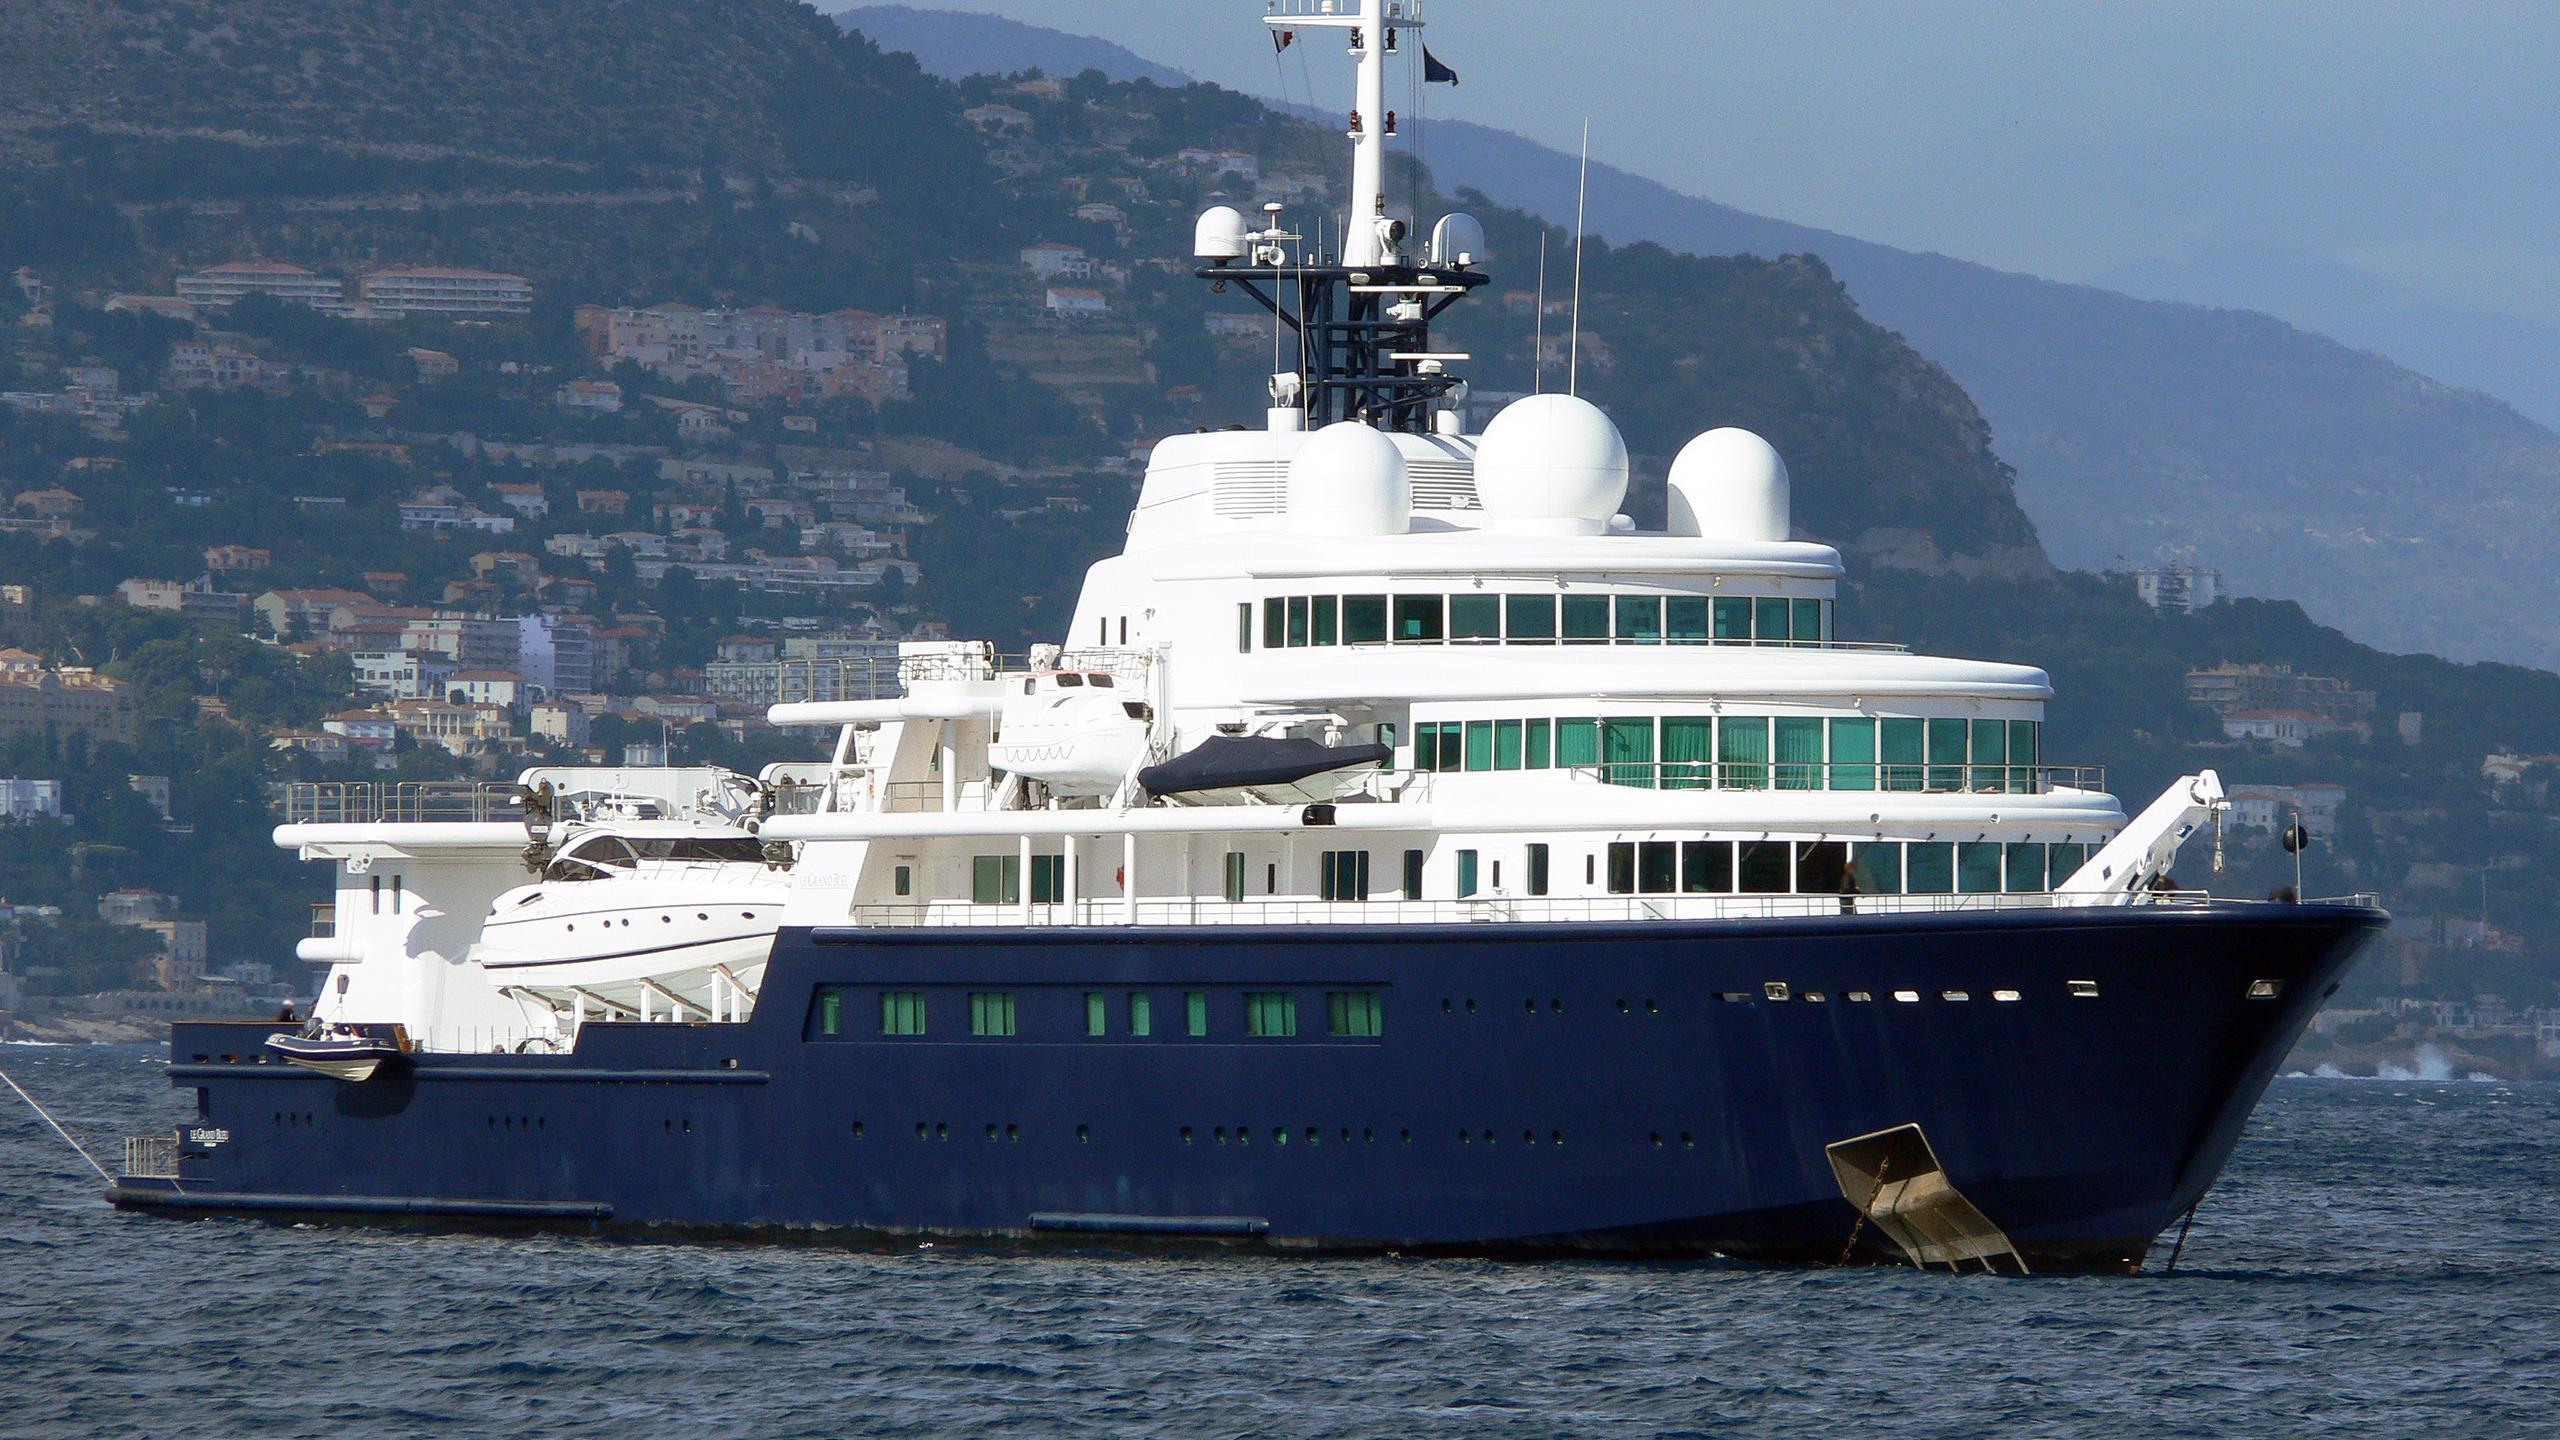 le-grand-bleu-explorer-yacht-bremer-vulkan-2000-113m-bow-profile